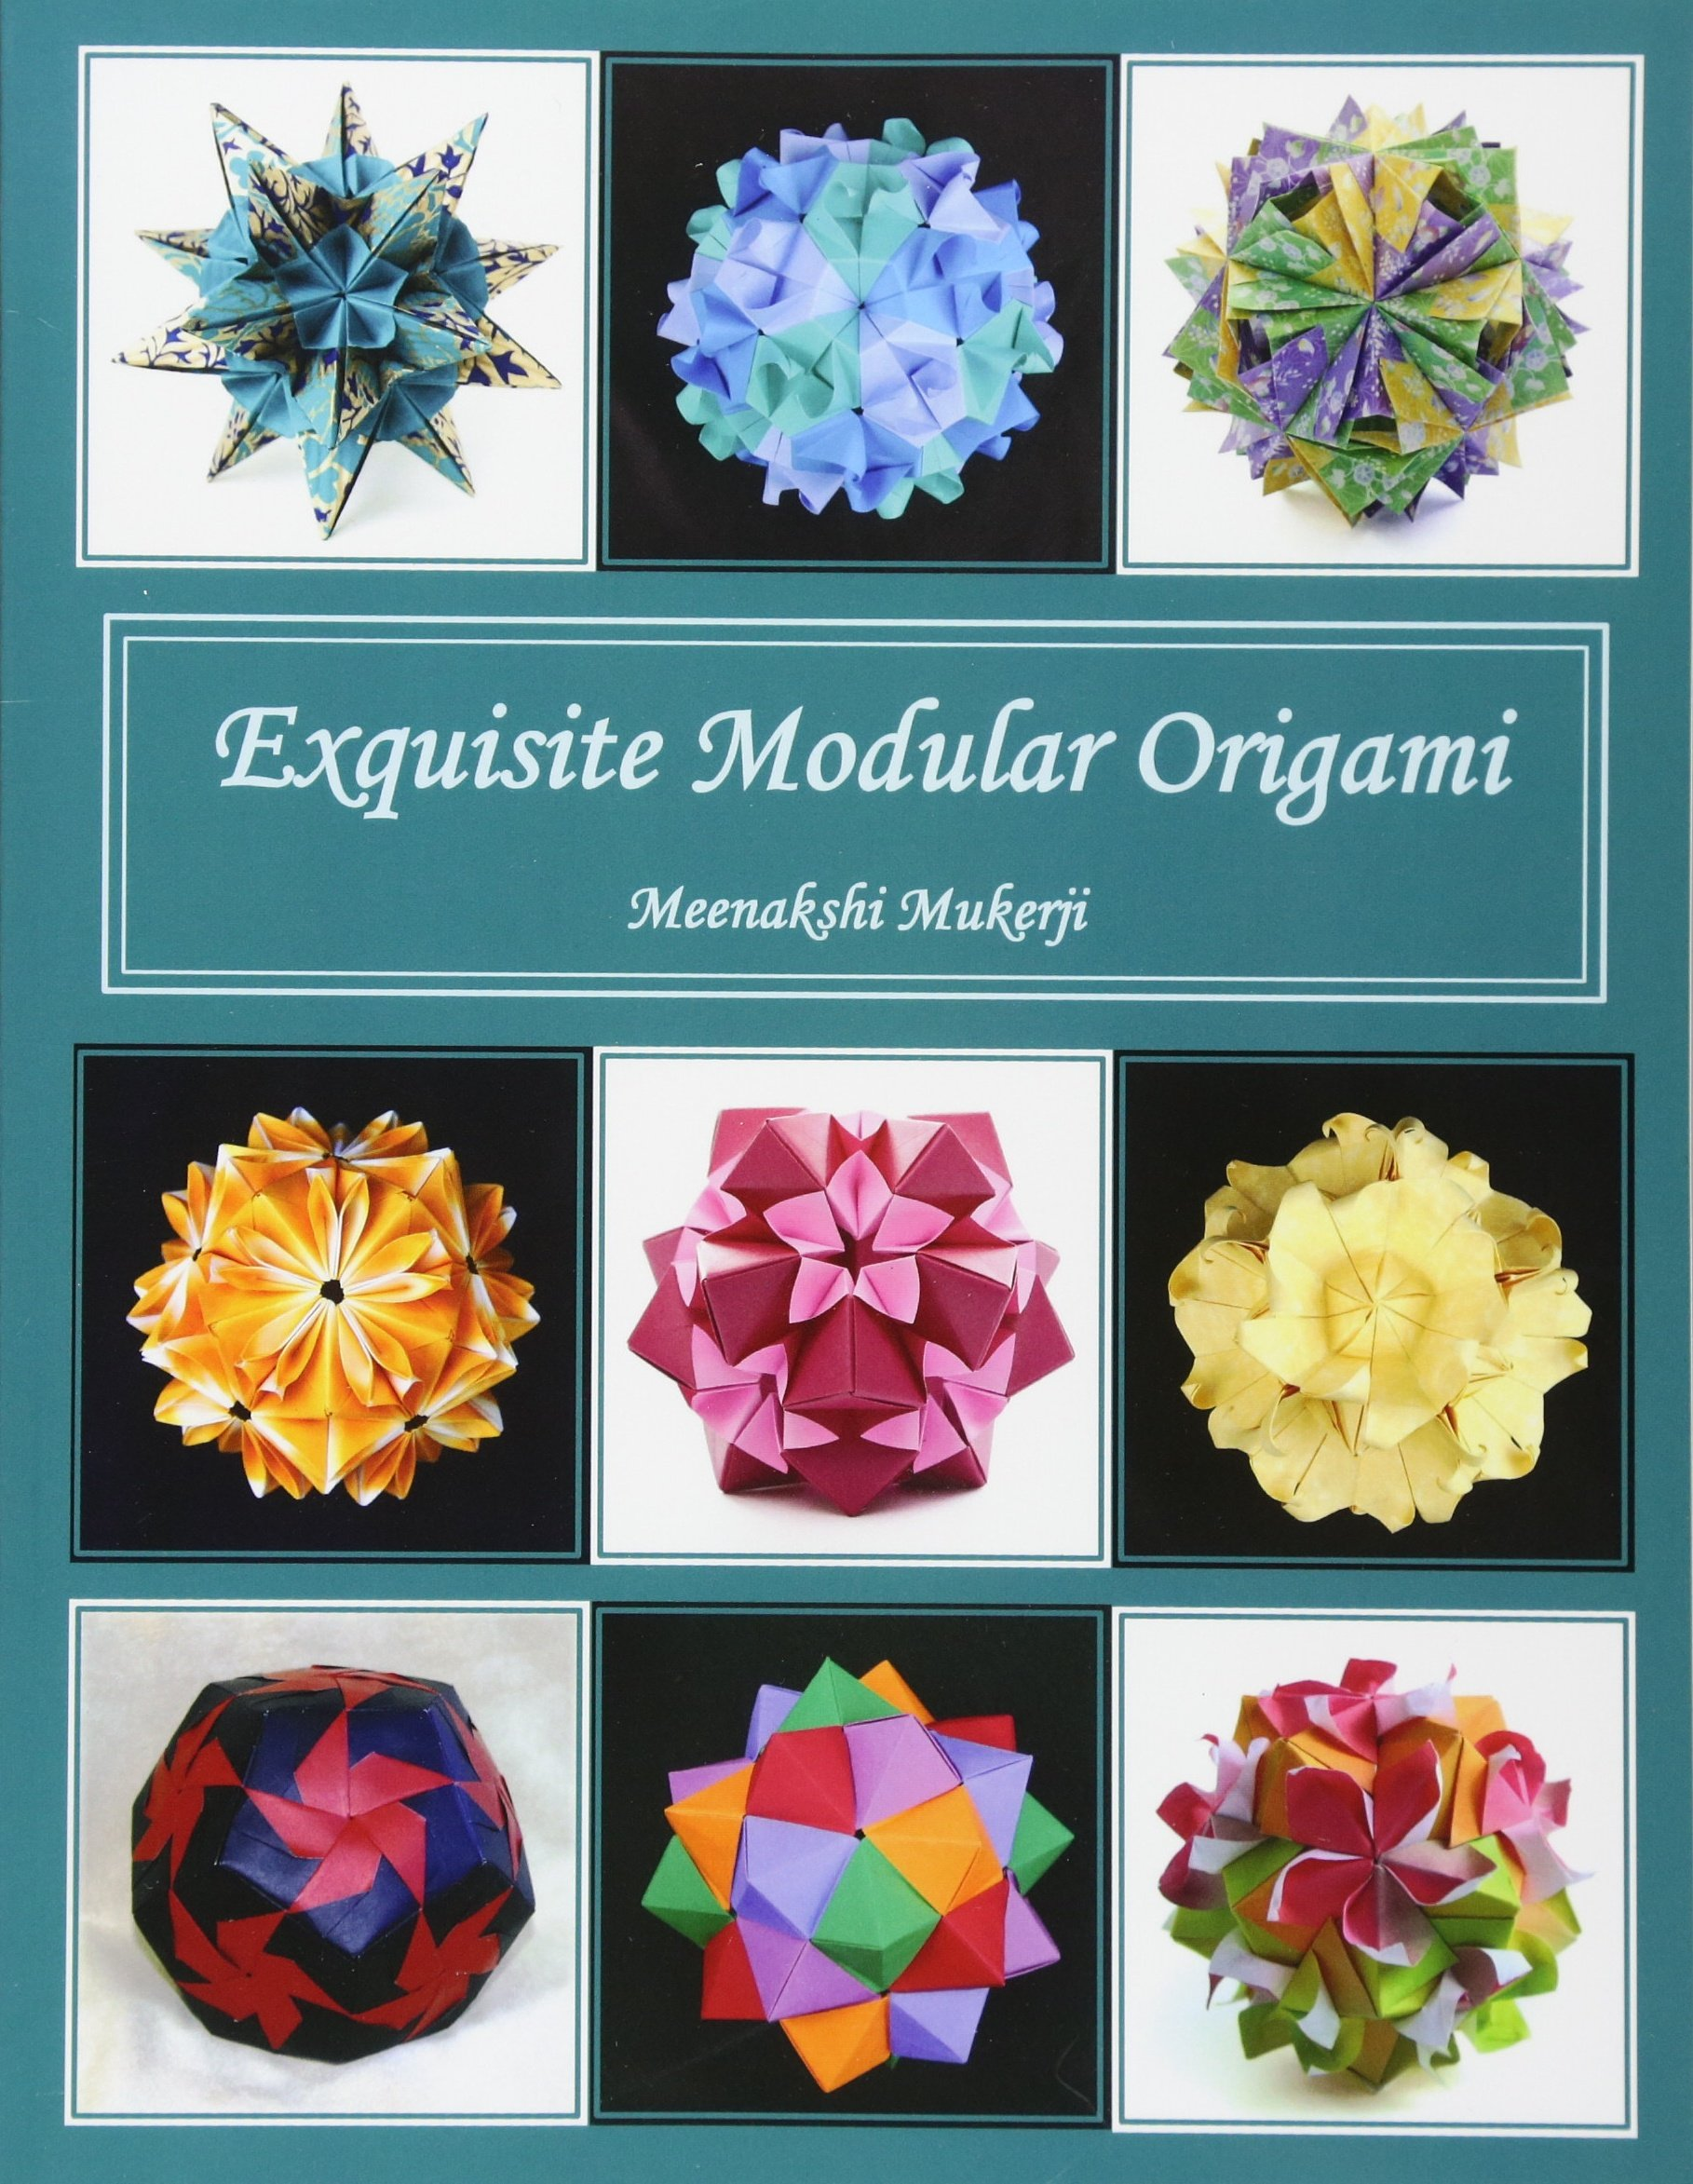 Exquisite Modular Origami Meenakshi Mukerji 9781463707606 Amazon